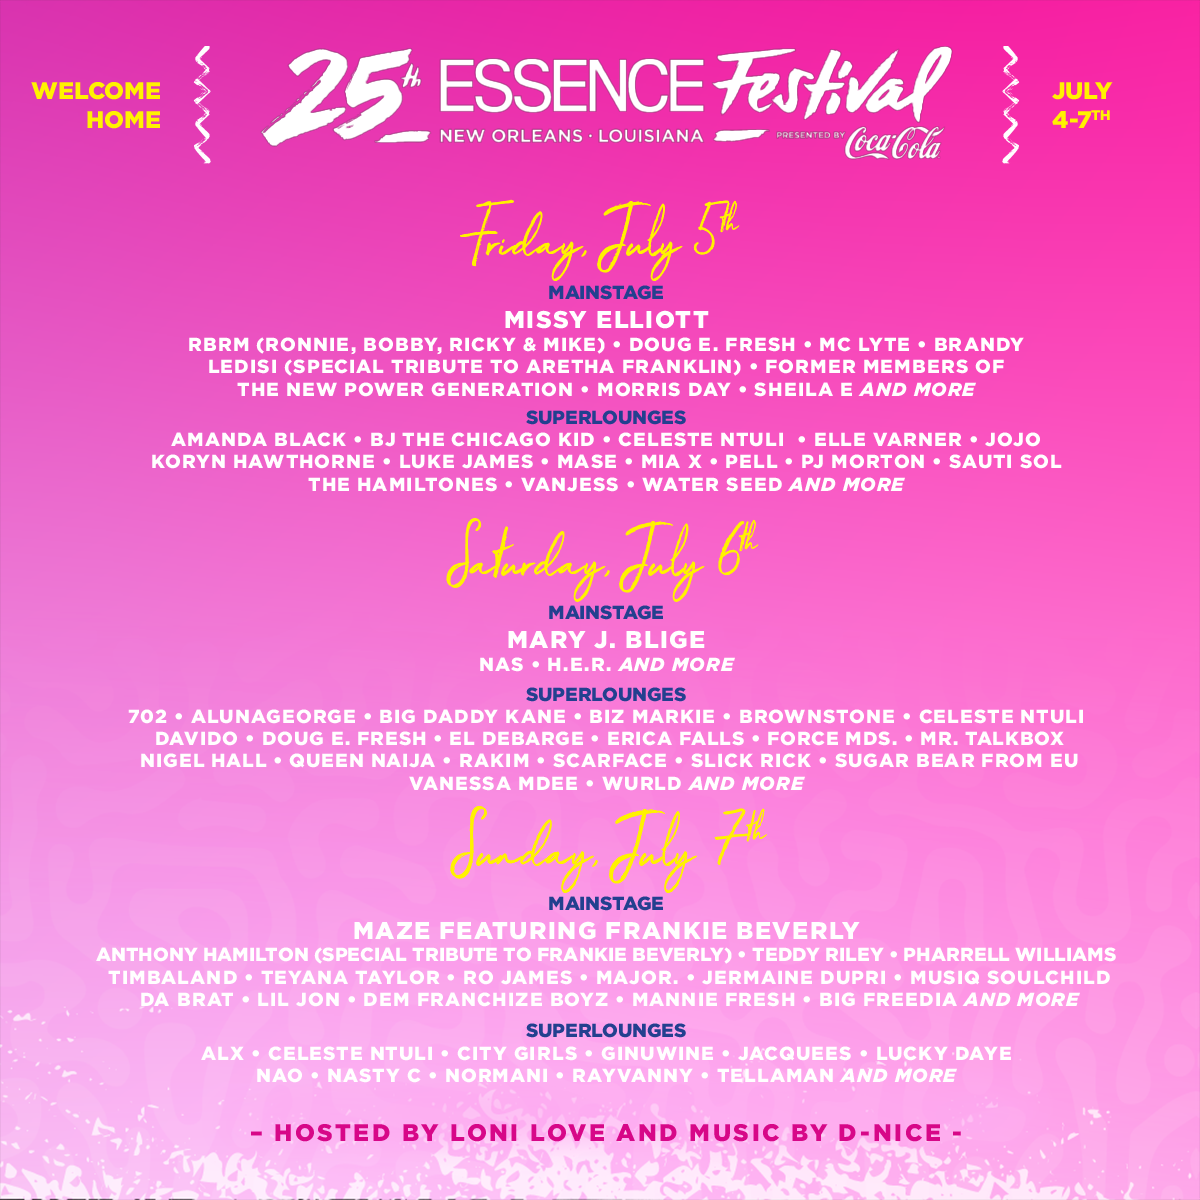 Essence Festival Giveaway